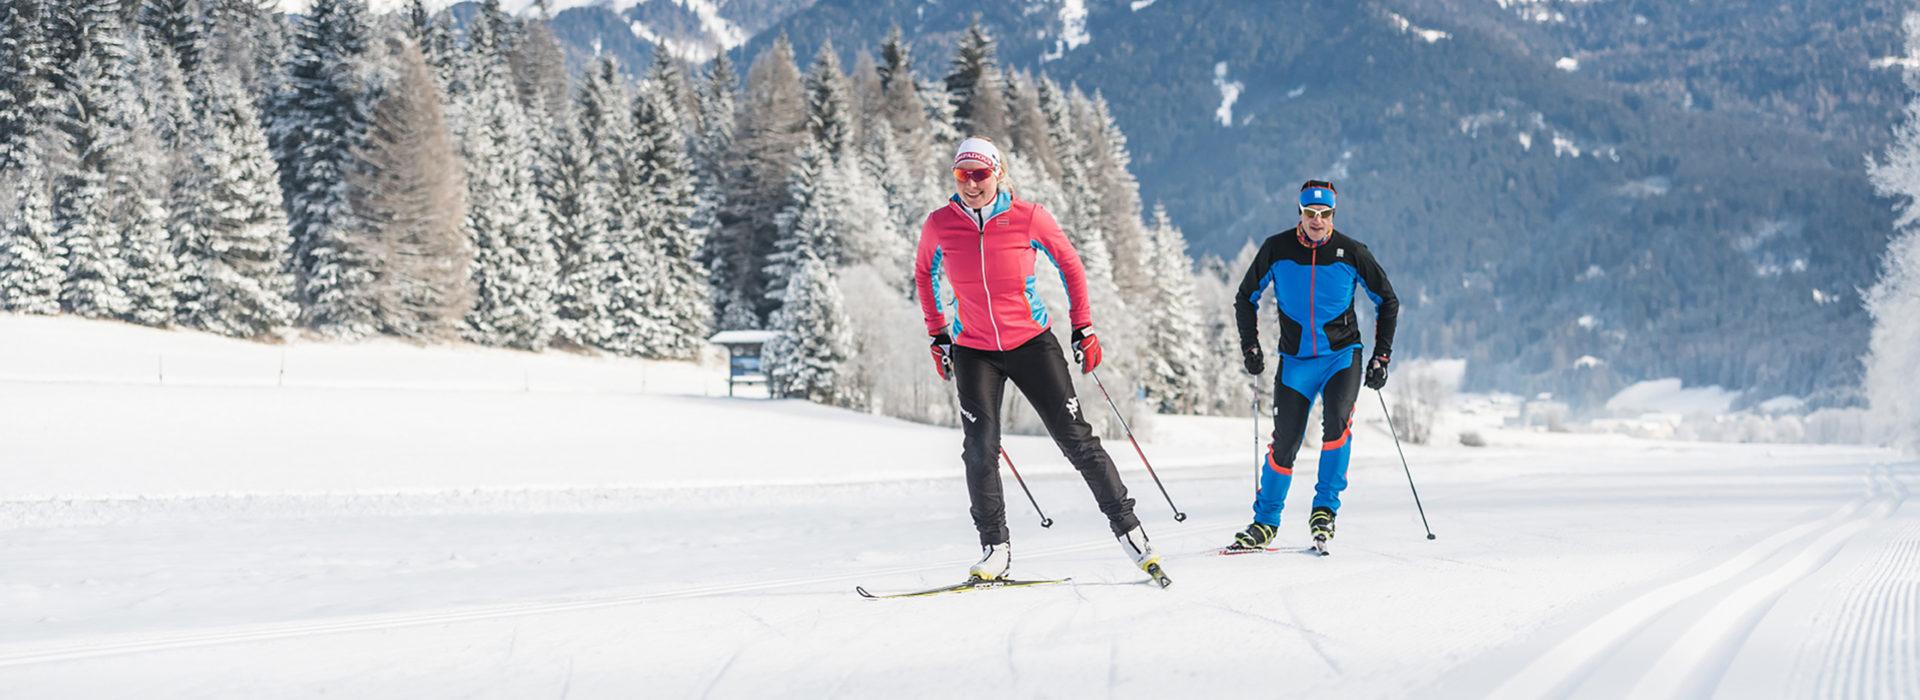 Langlaufurlaub in Südtirol - langlauf-regionen